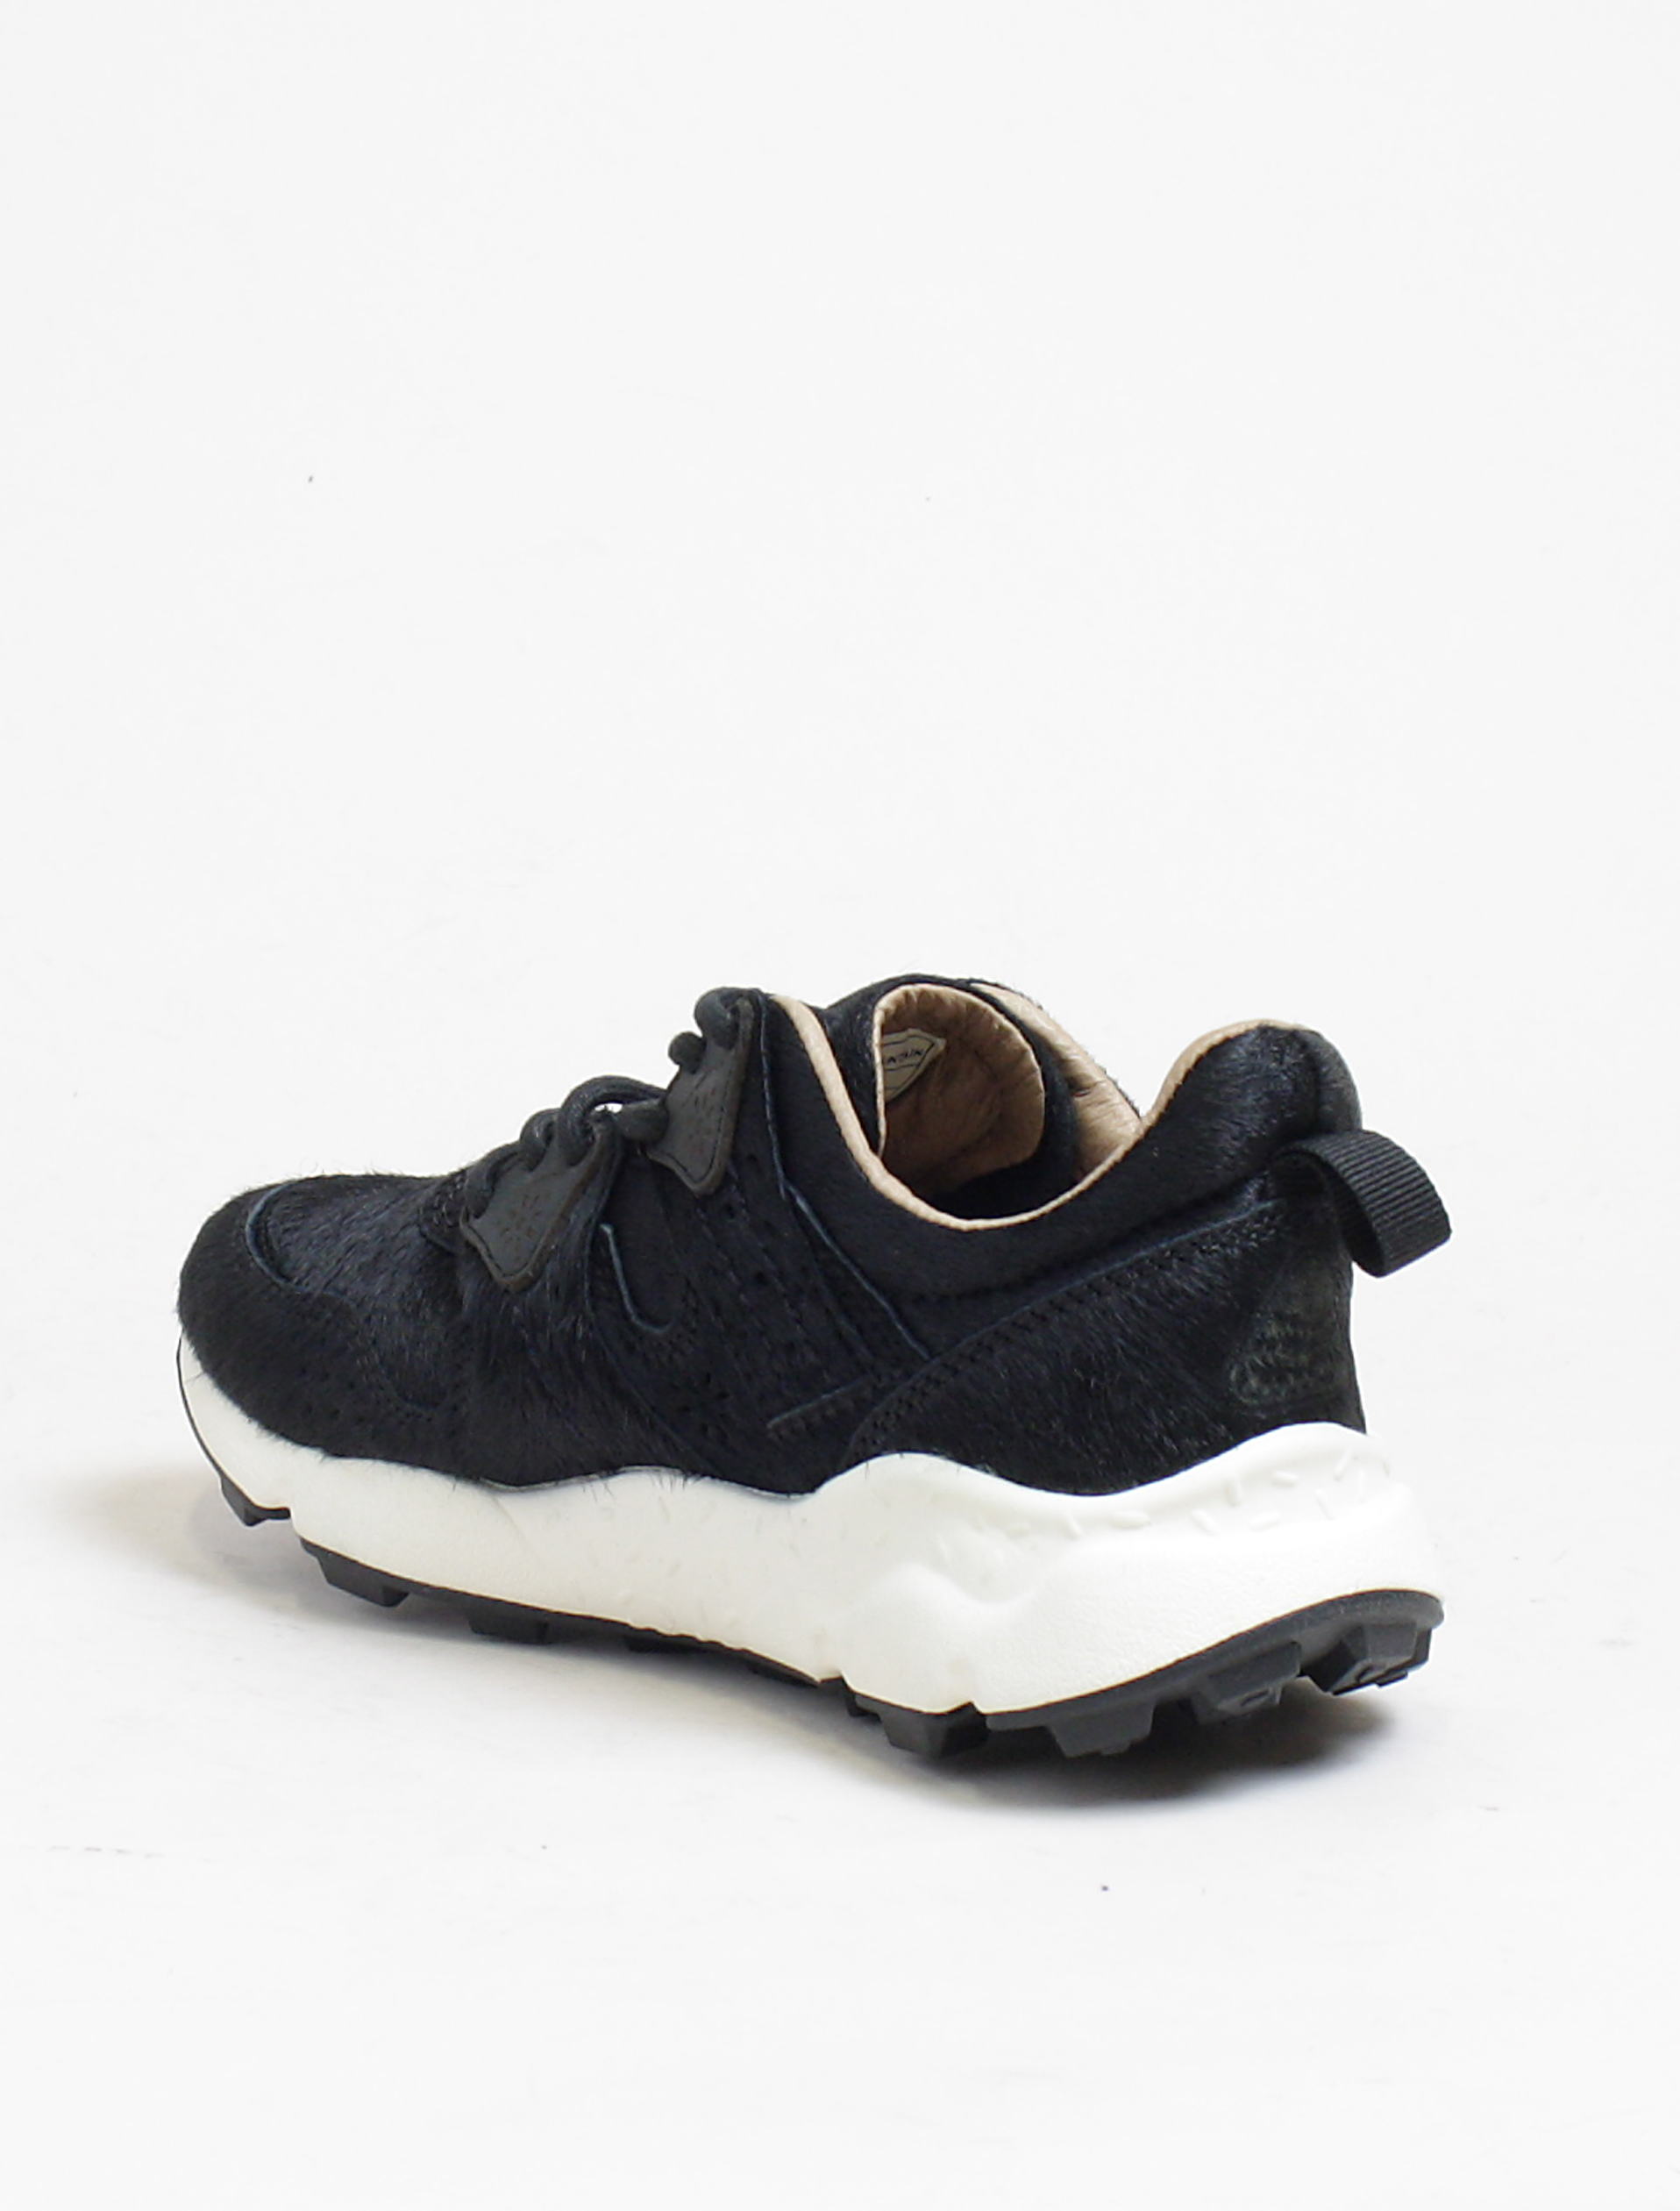 Flower Mountain sneakers Corax 2 horse hair black dettaglio interno